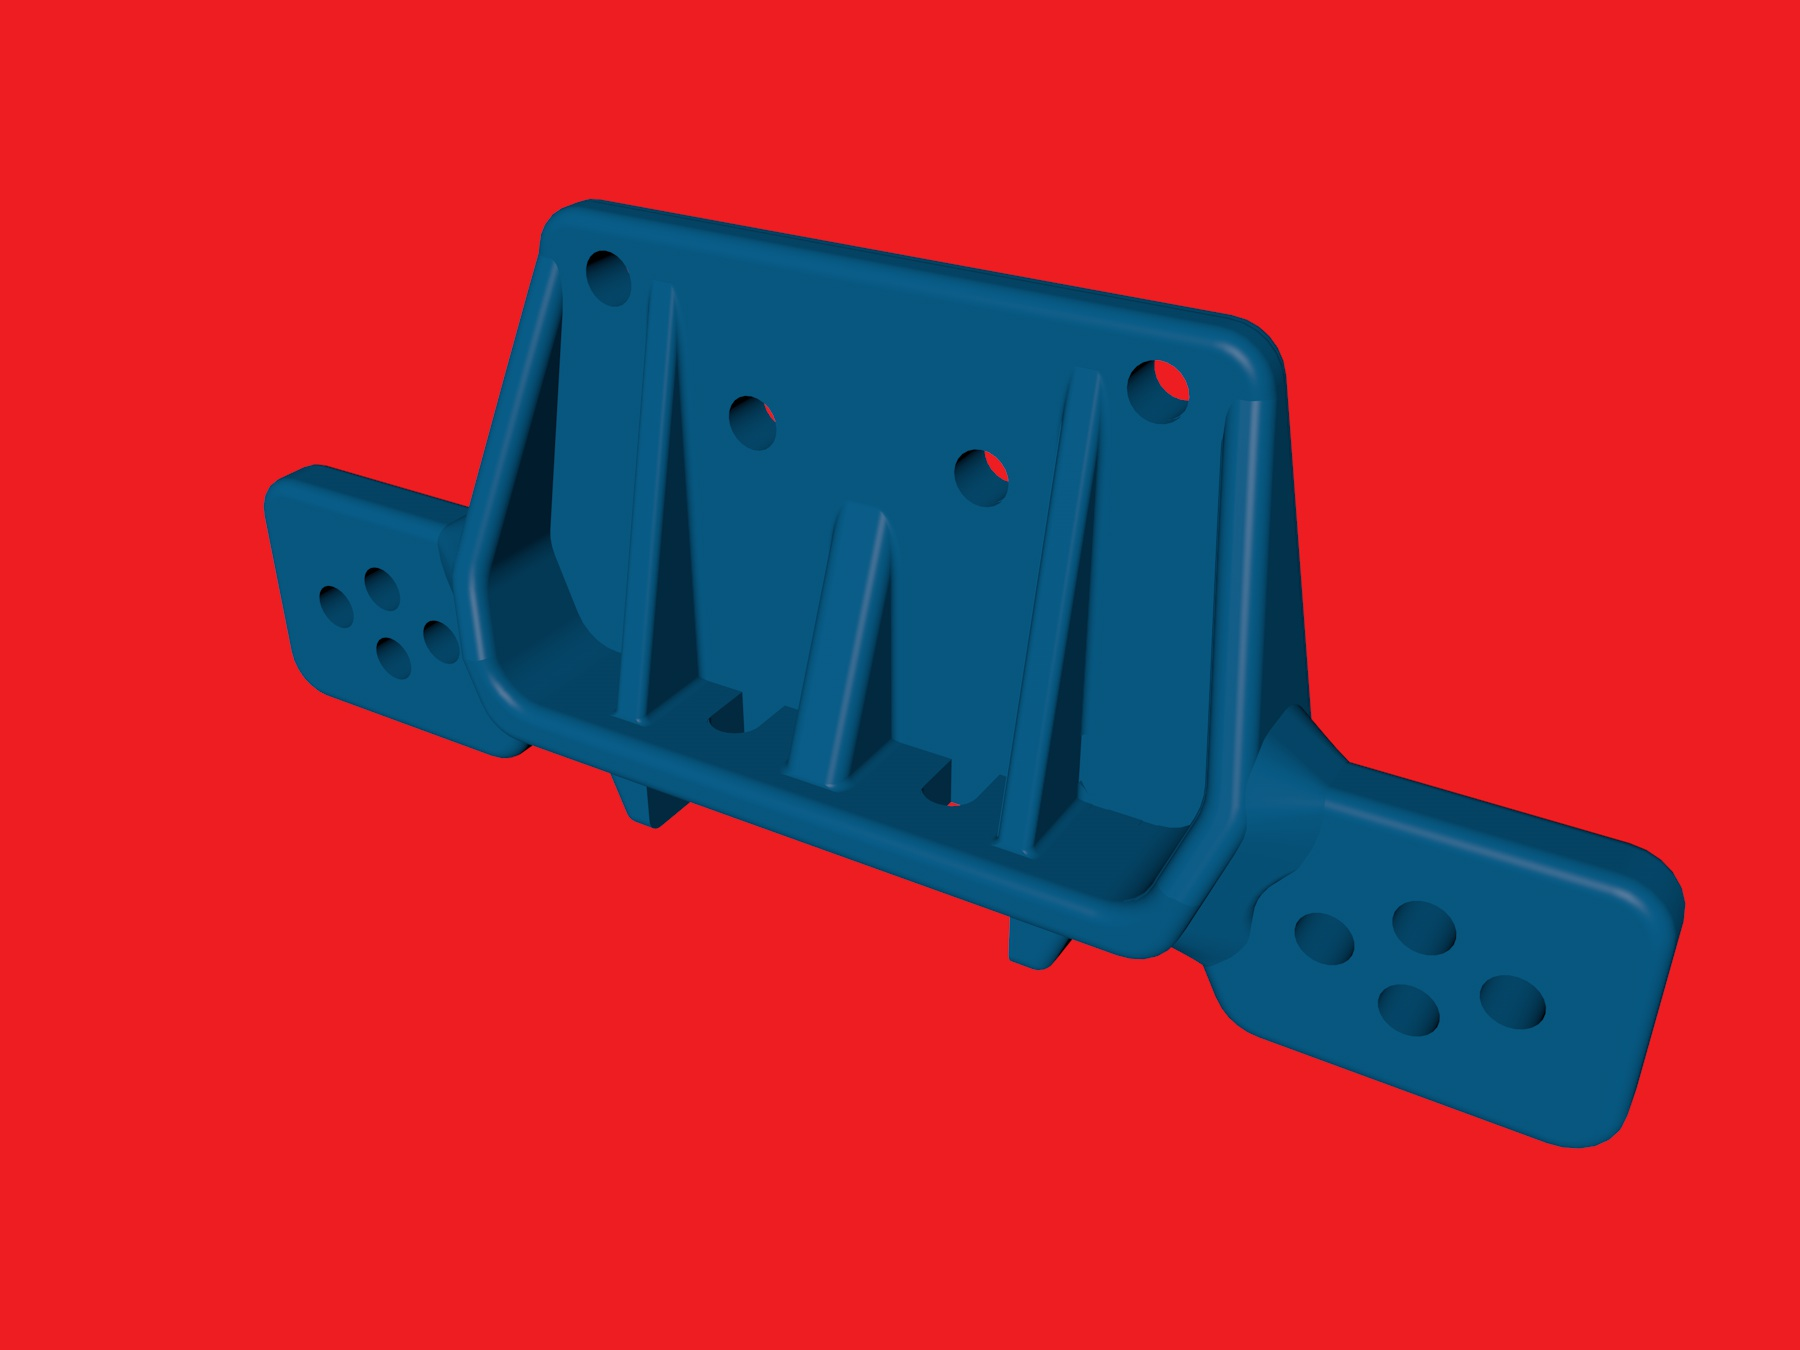 tamiya wrenchdog dyna storm dyna blaster tr-15t conversion trf211x ds211x reinforced d3 shocktower